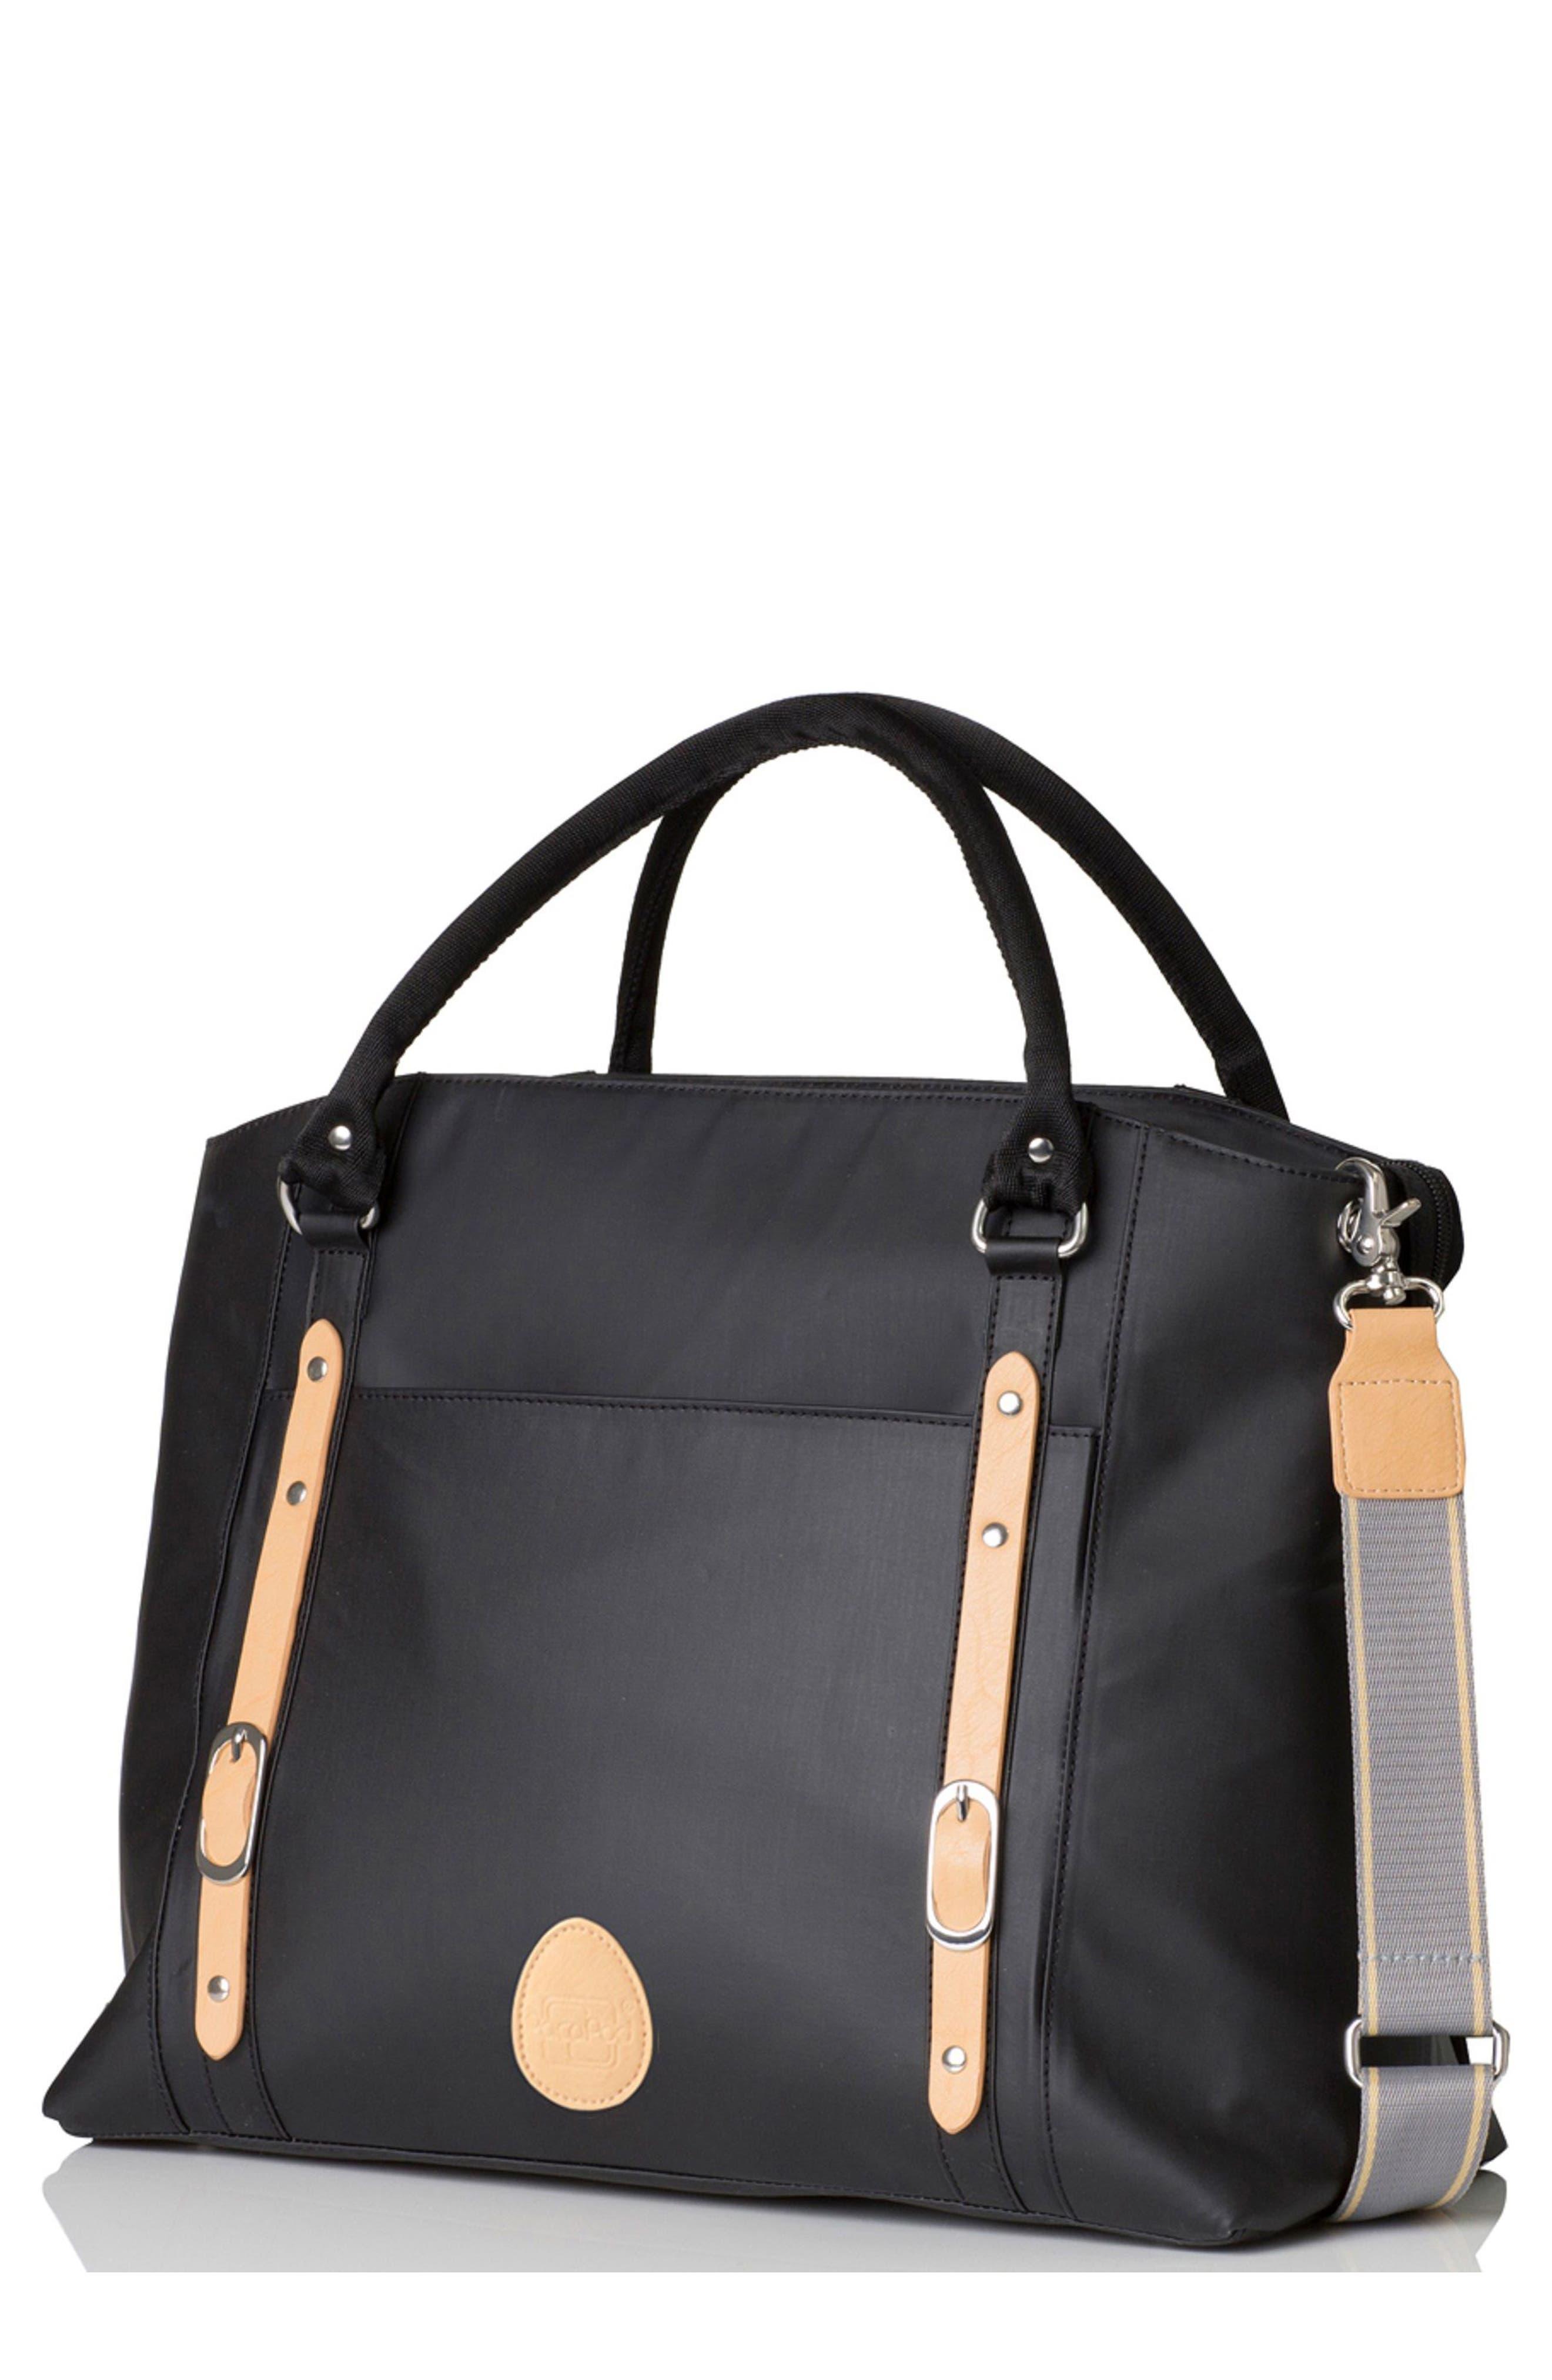 'Mirano' Diaper Bag,                             Alternate thumbnail 2, color,                             BLACK